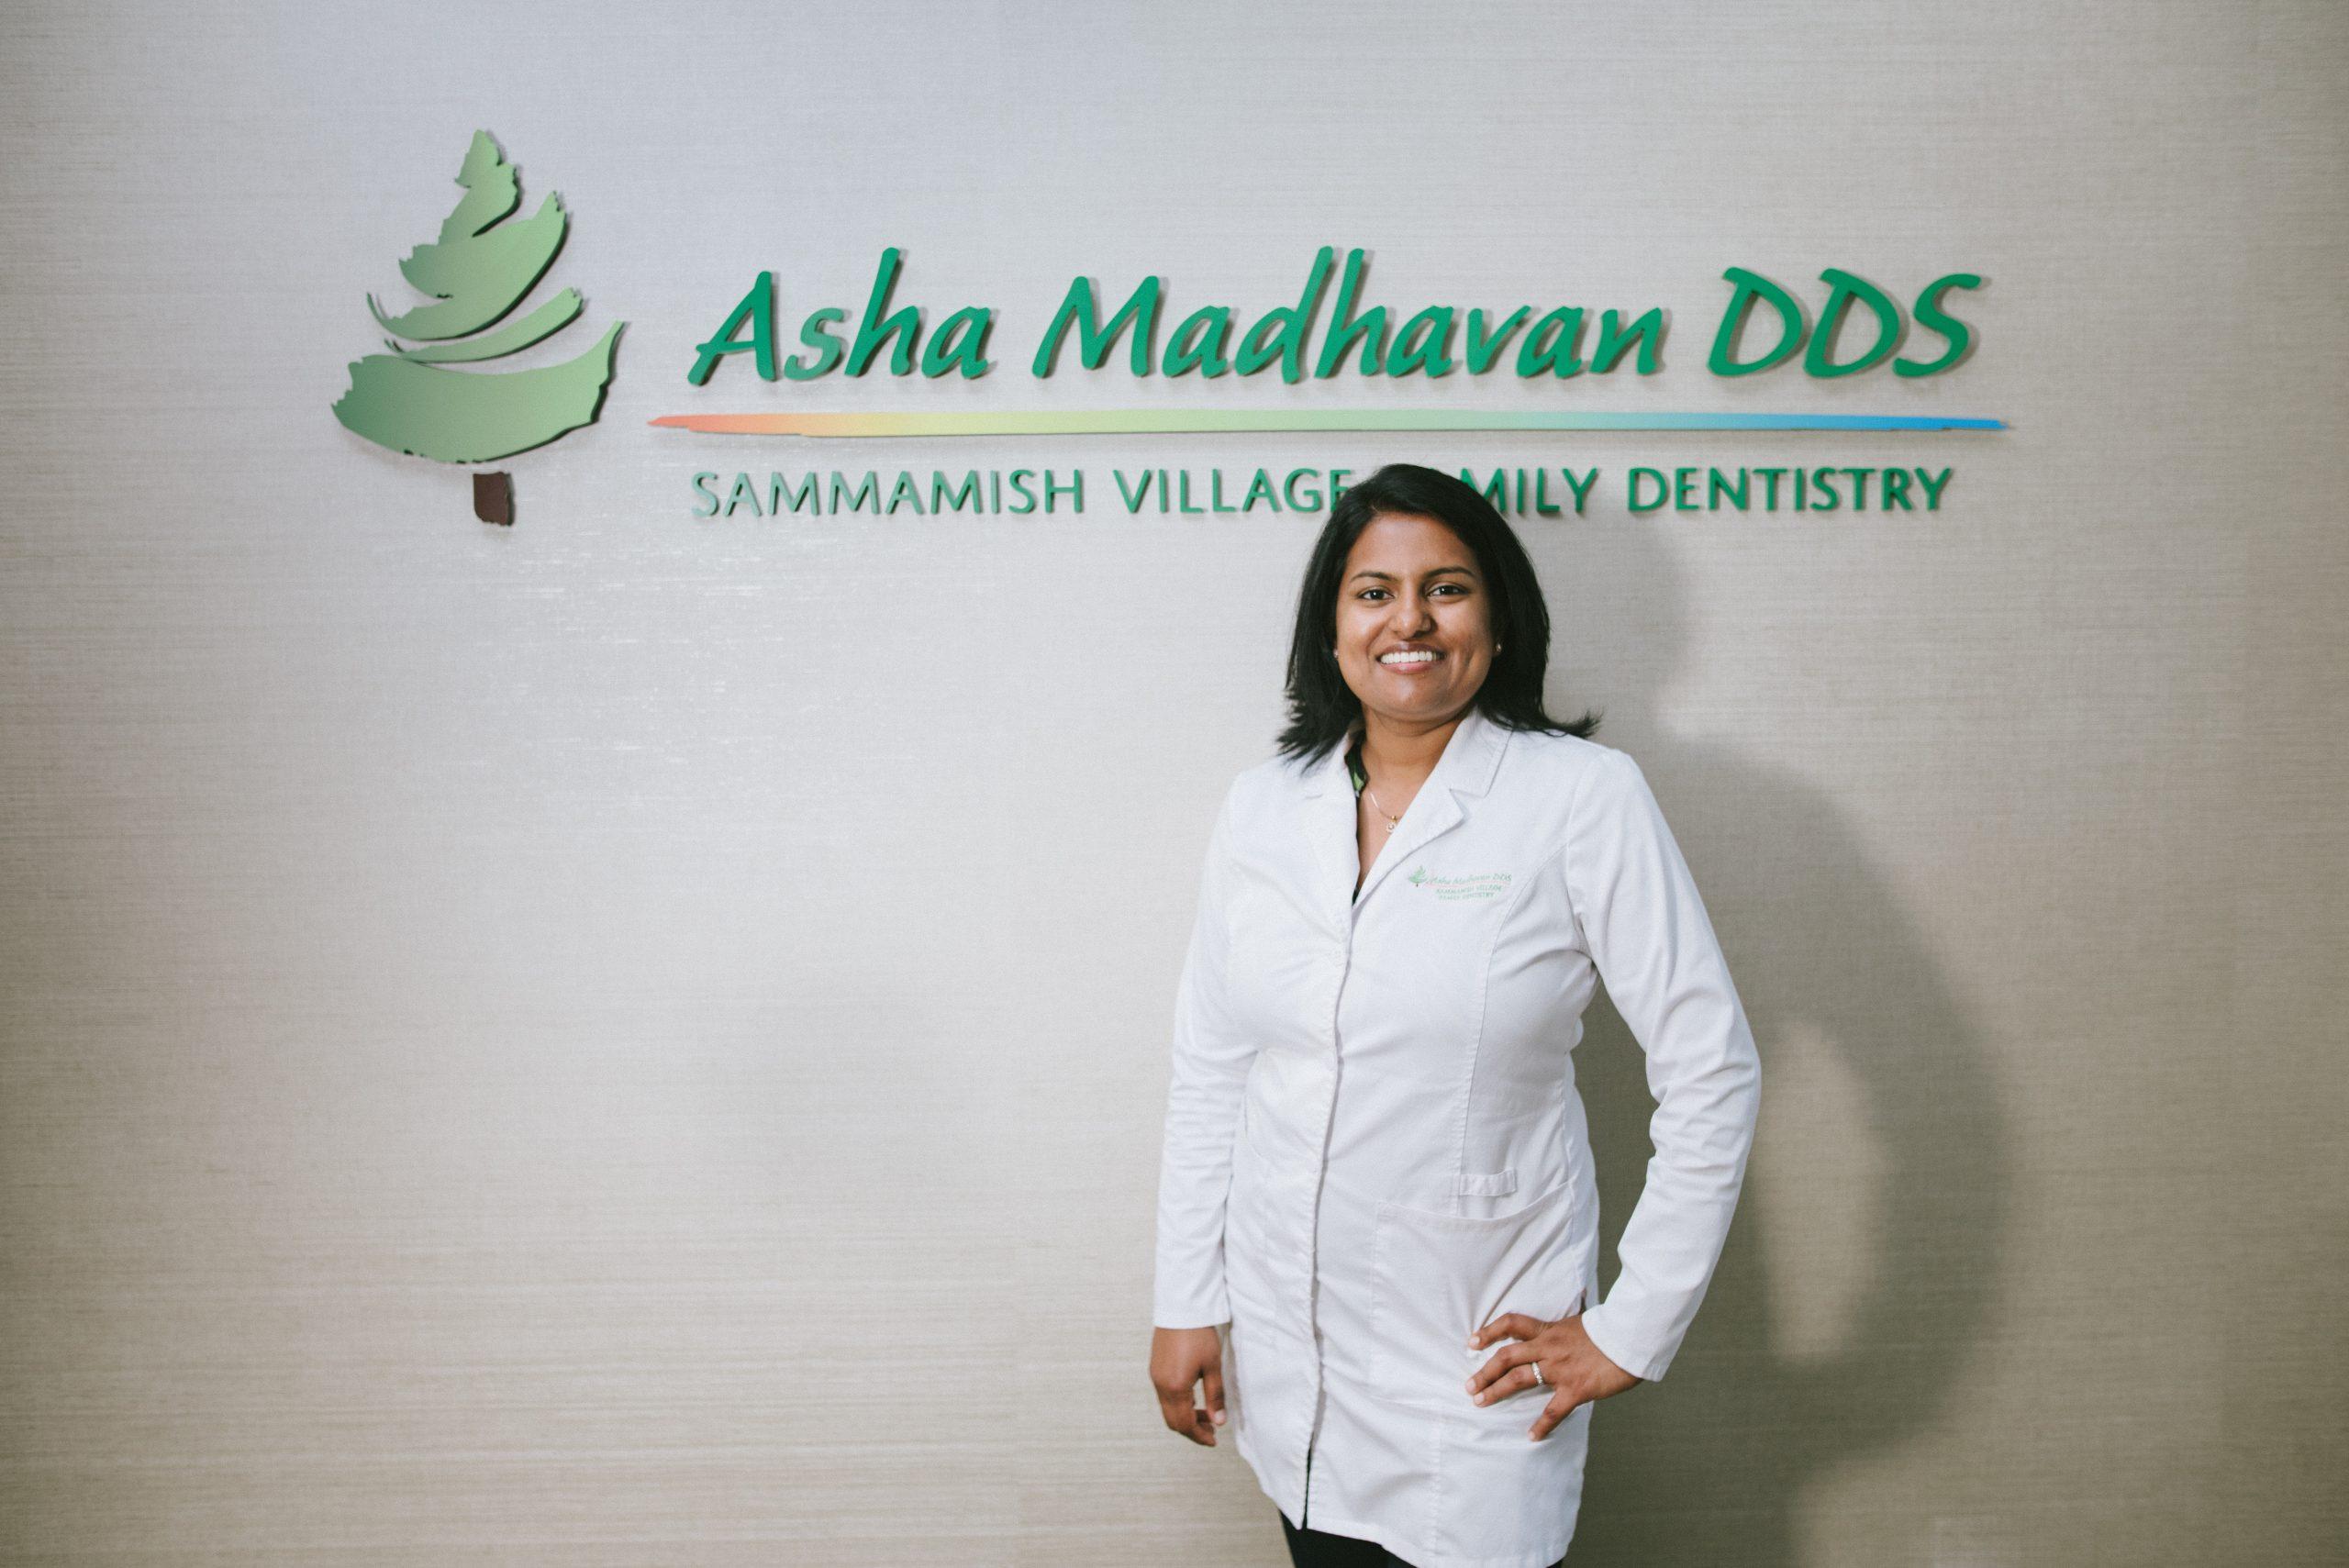 Asha Madhavan DDS